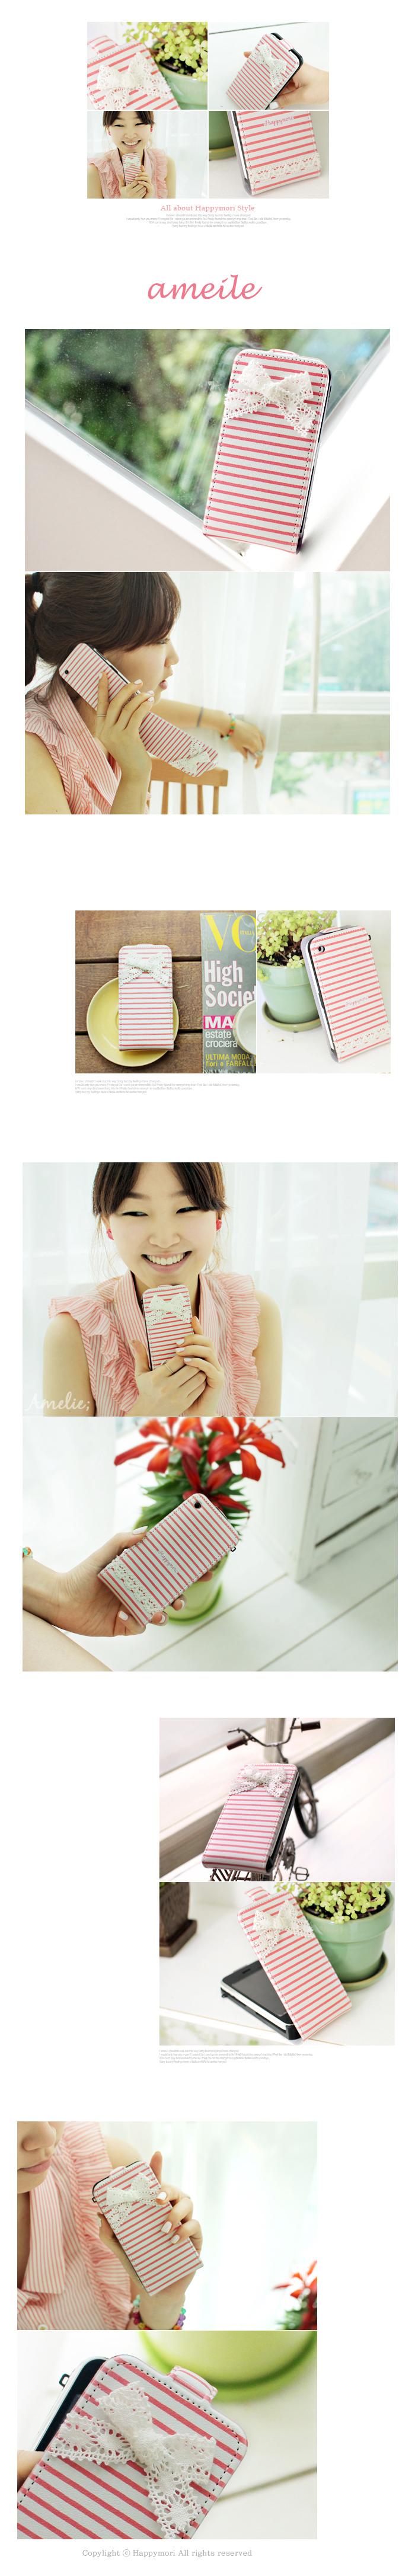 Happymori iPhone4S/4  話題の可愛いケースハッピーモリ-Amelie(フォルダータイプ)